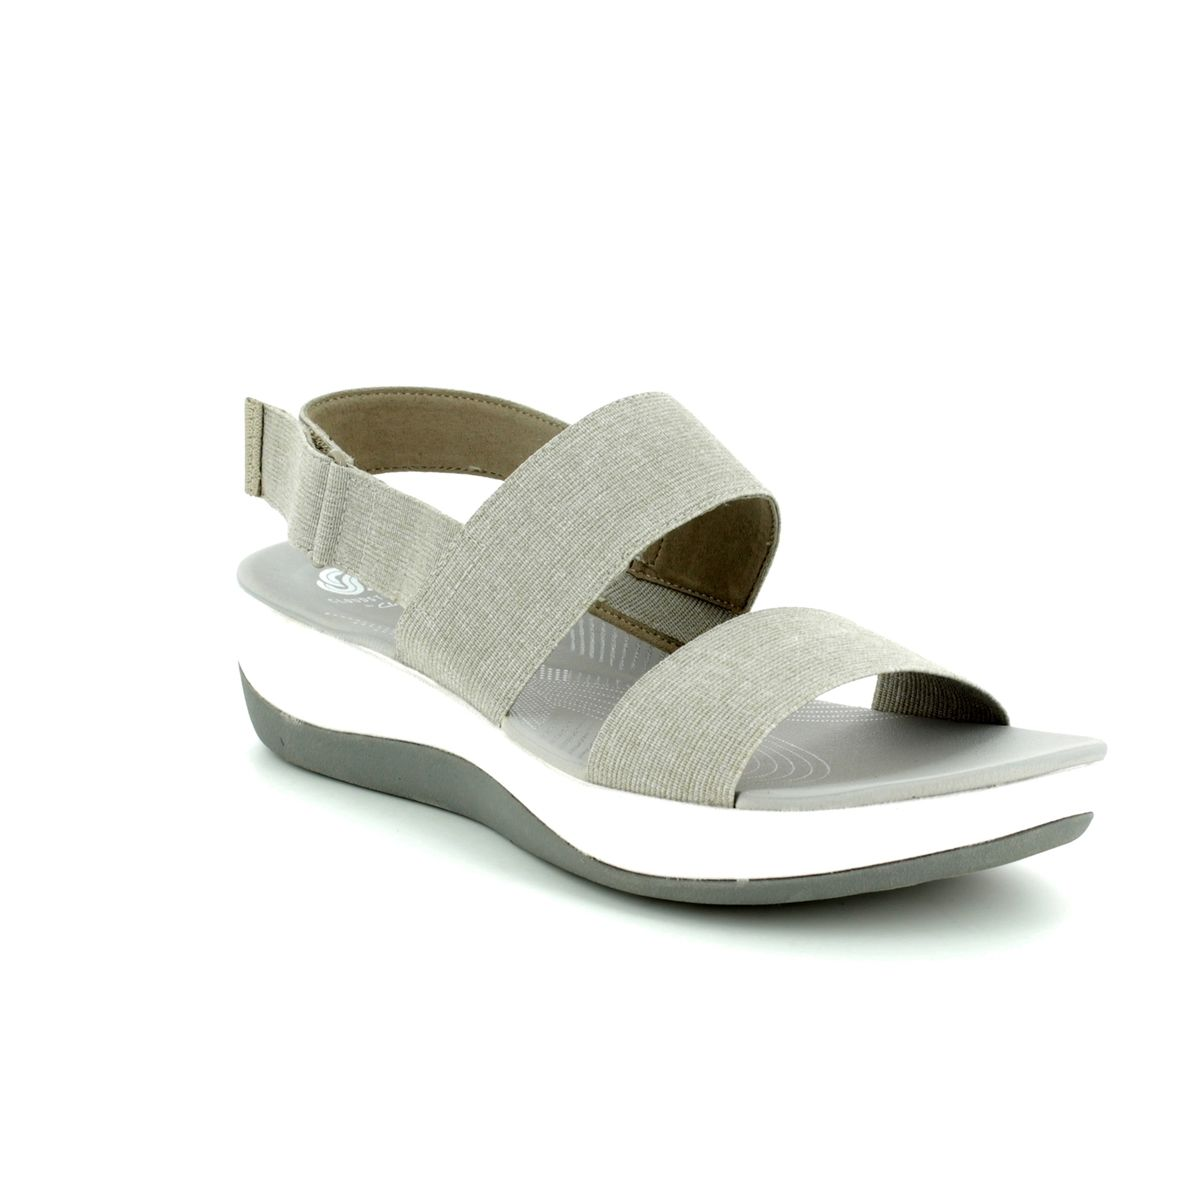 259654d Arla Jacory at Begg Shoes & Bags